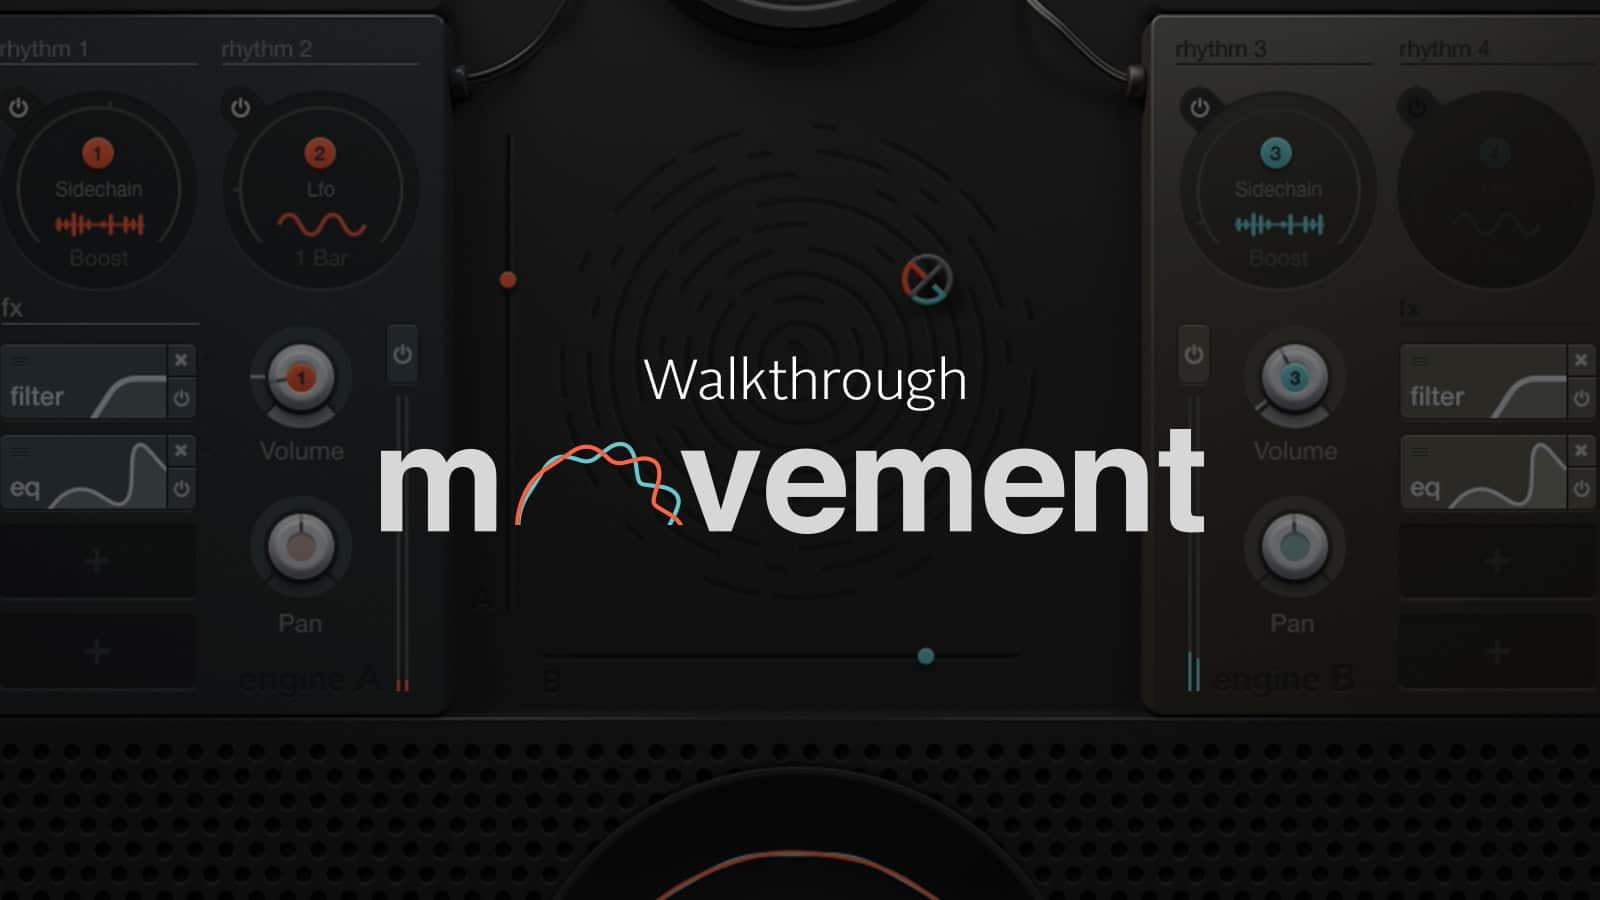 walkthrough movement_banner image